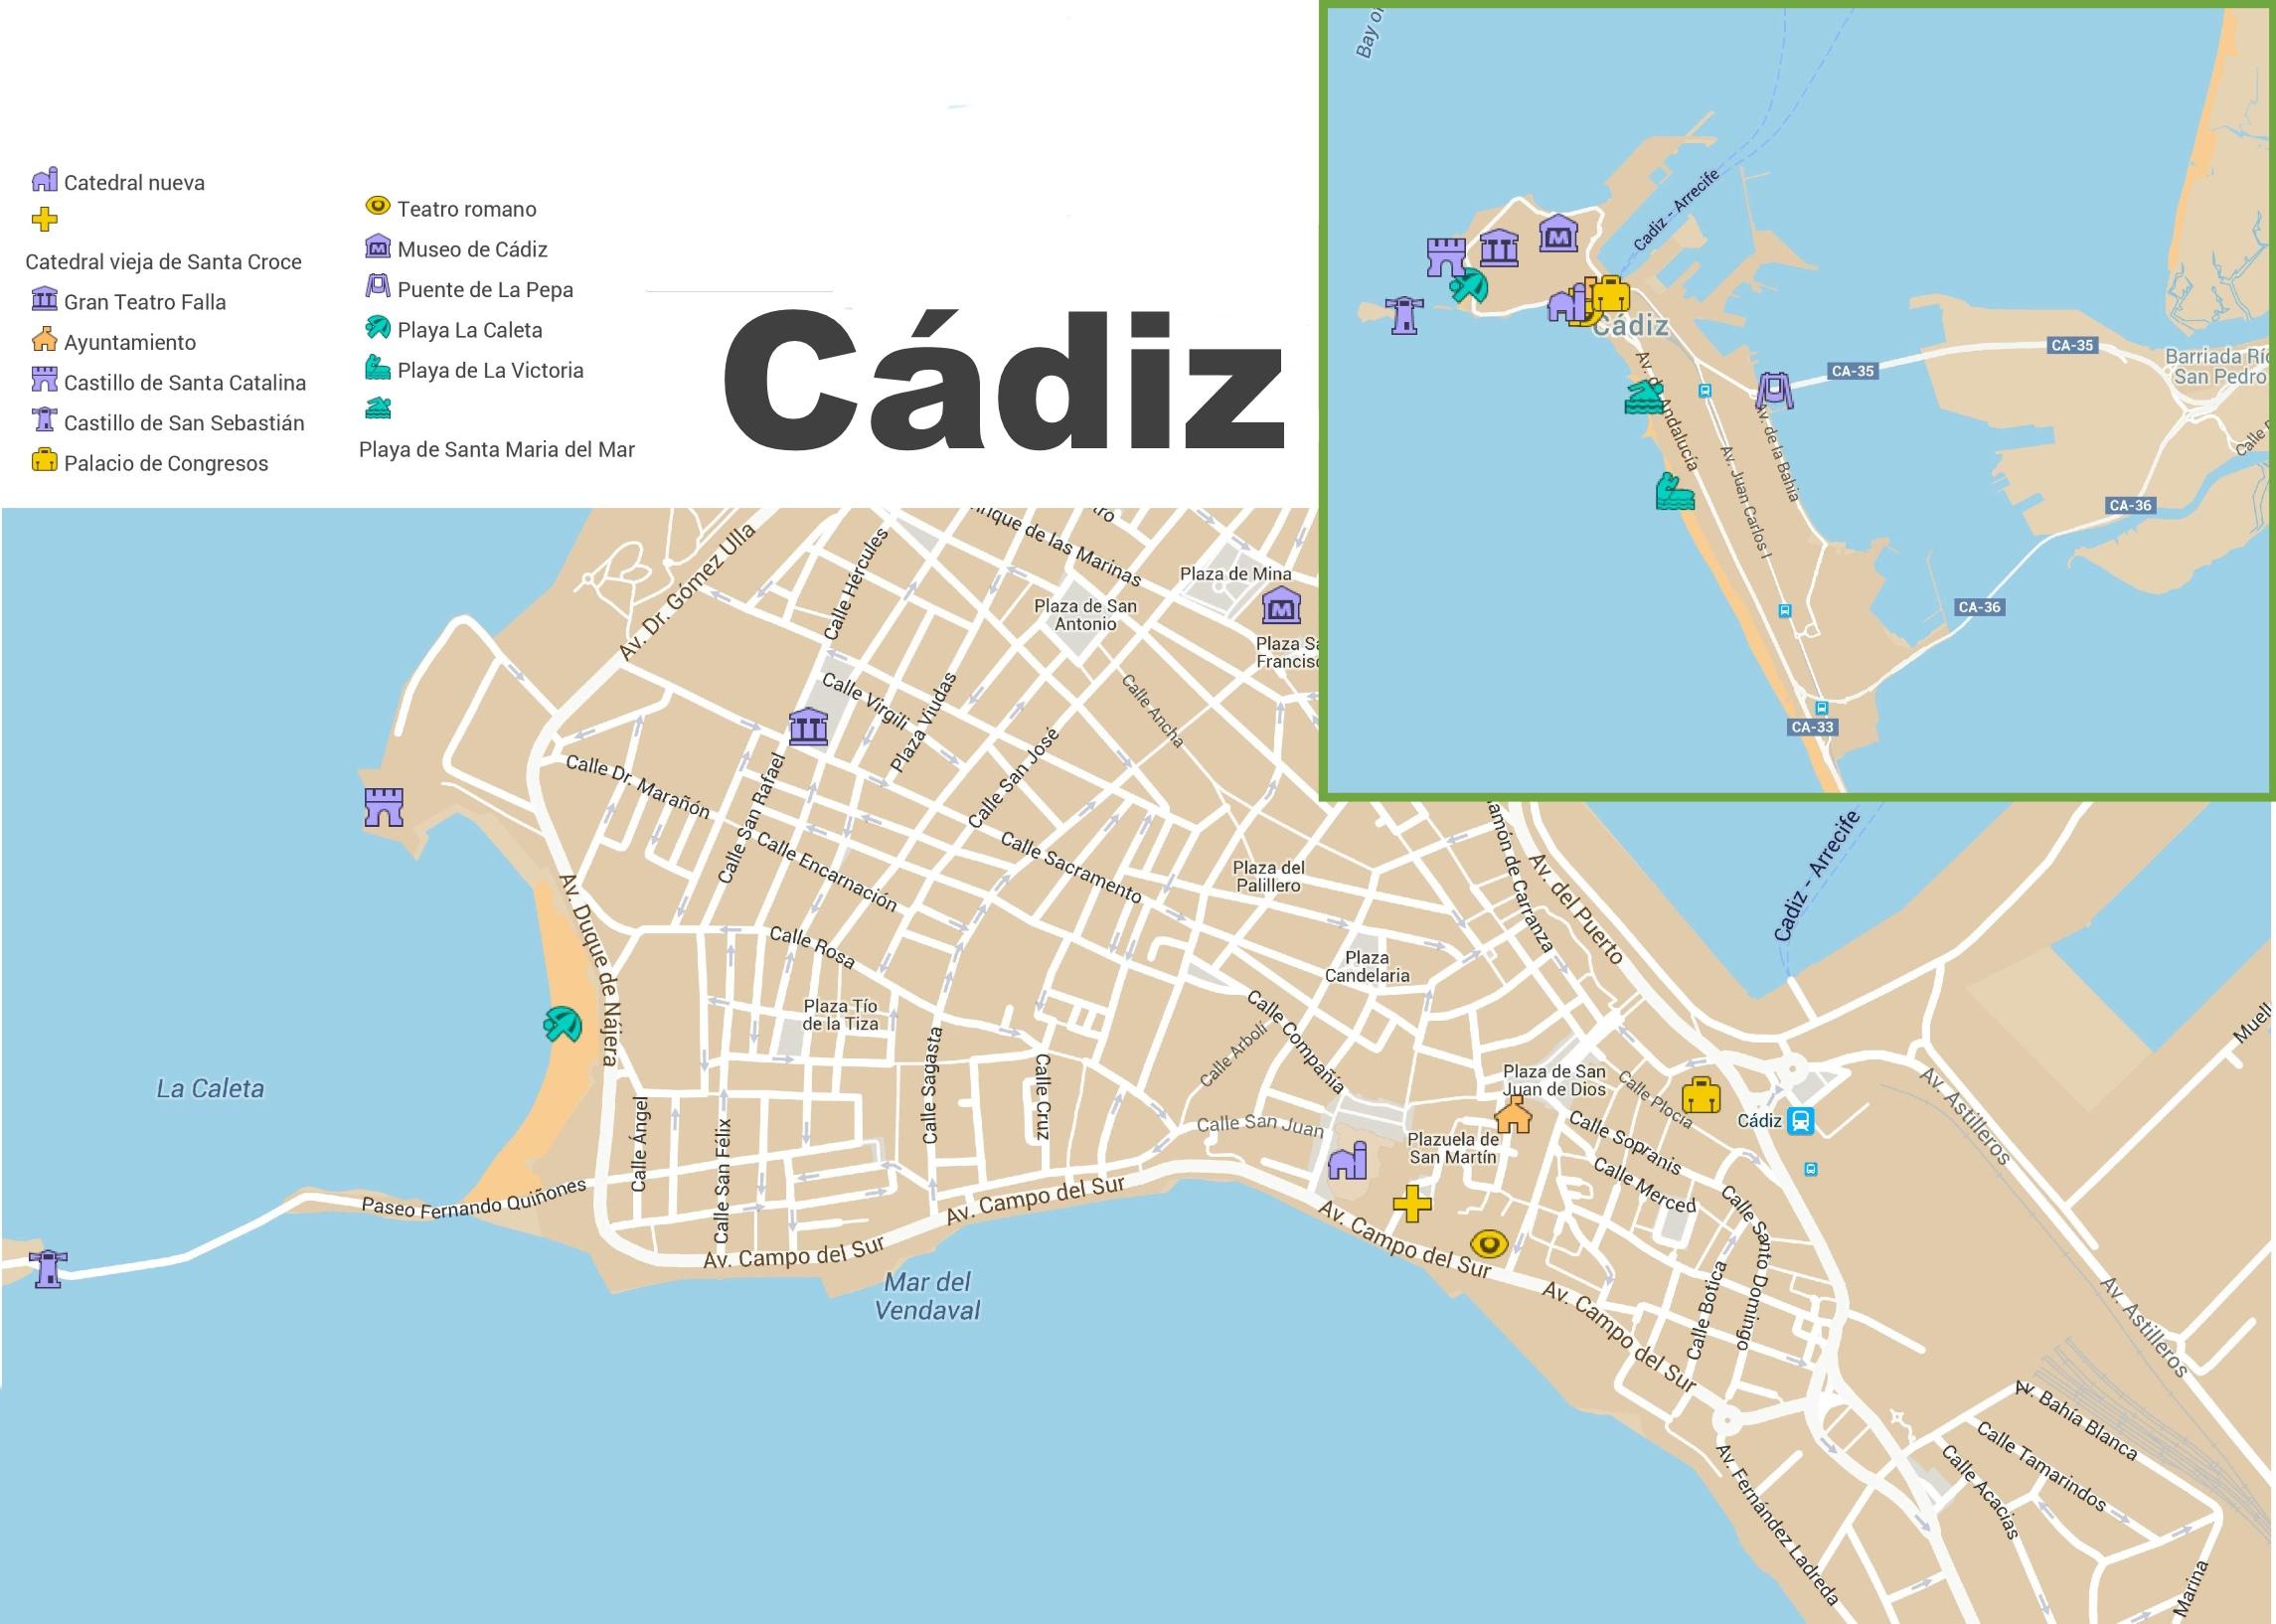 Map Of Spain Cadiz.Cadiz Tourist Map